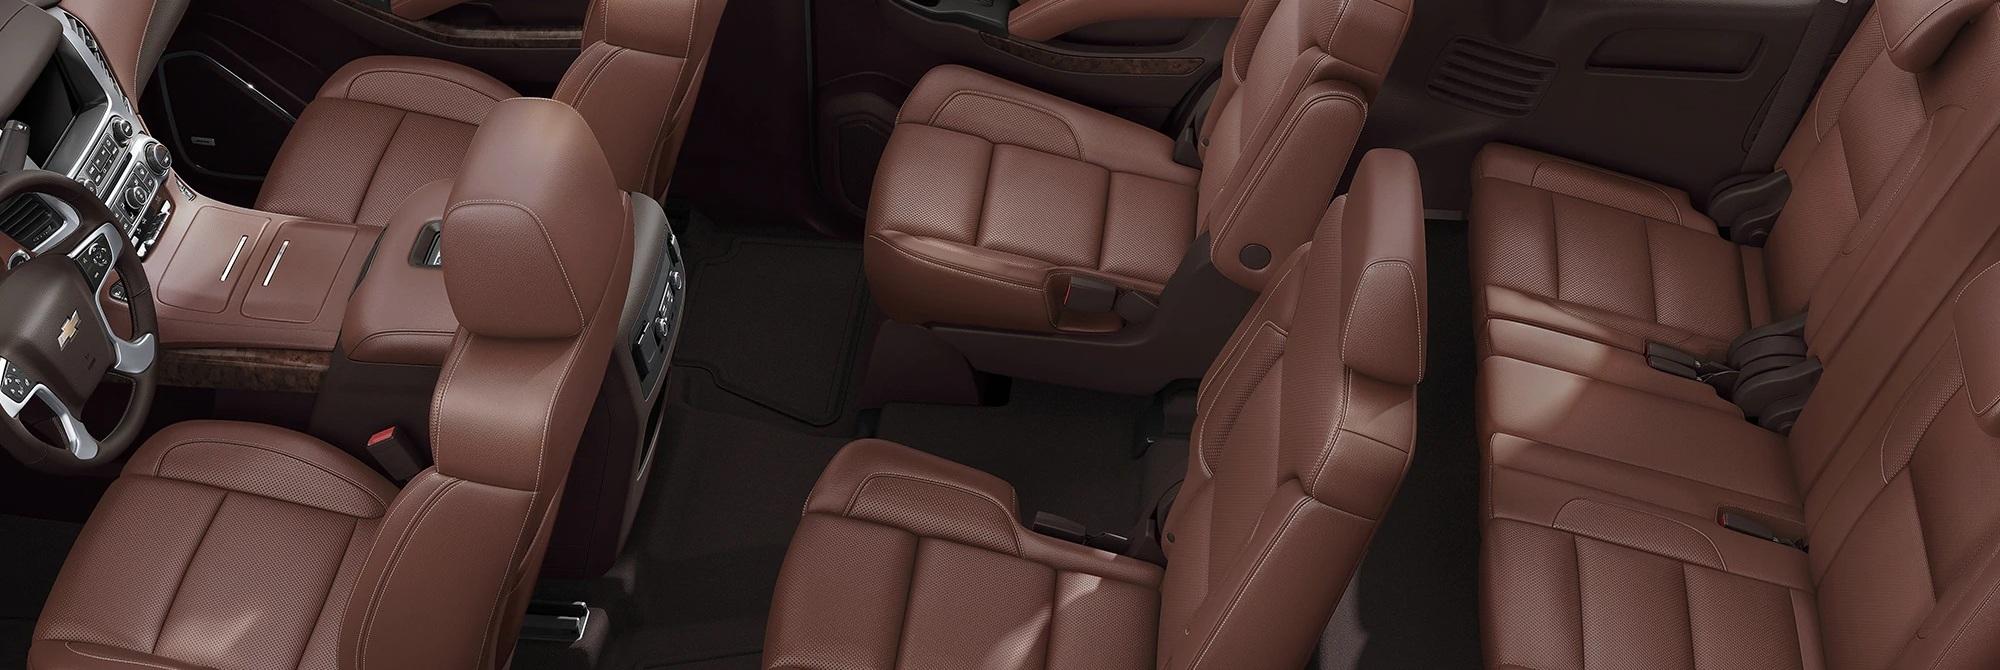 2020 Chevrolet Tahoe Seating